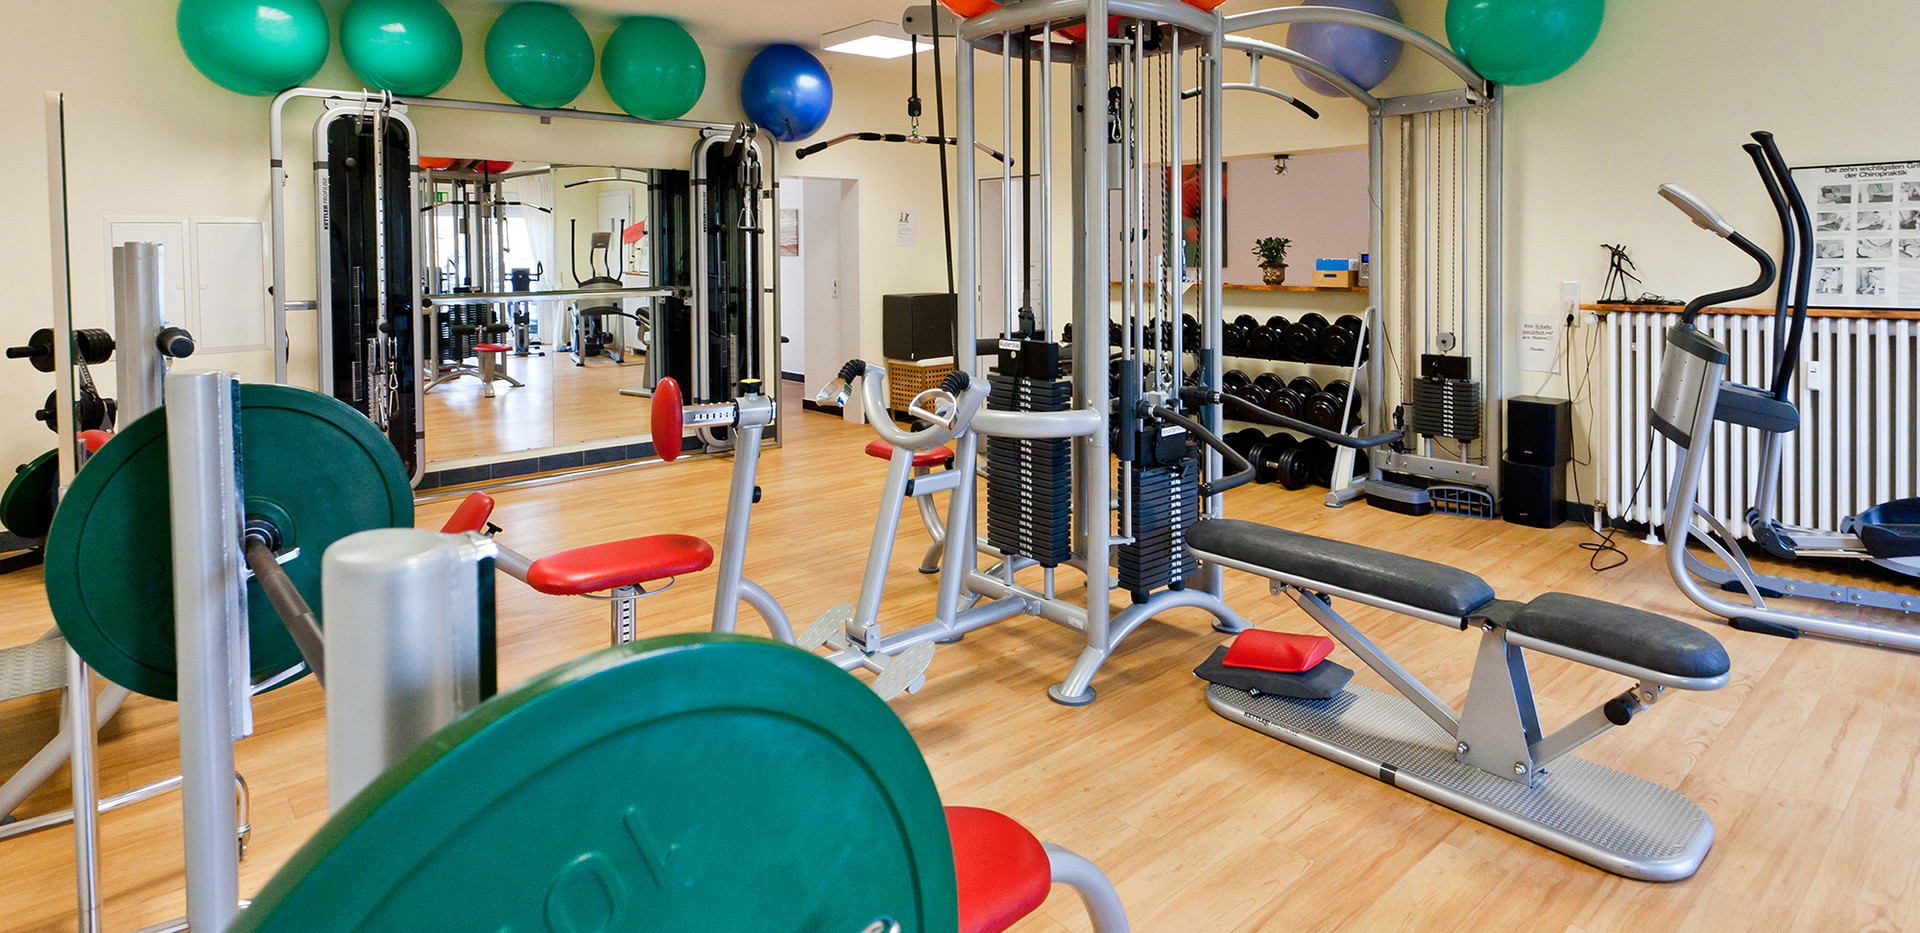 Physiotherapie Fitnessraum